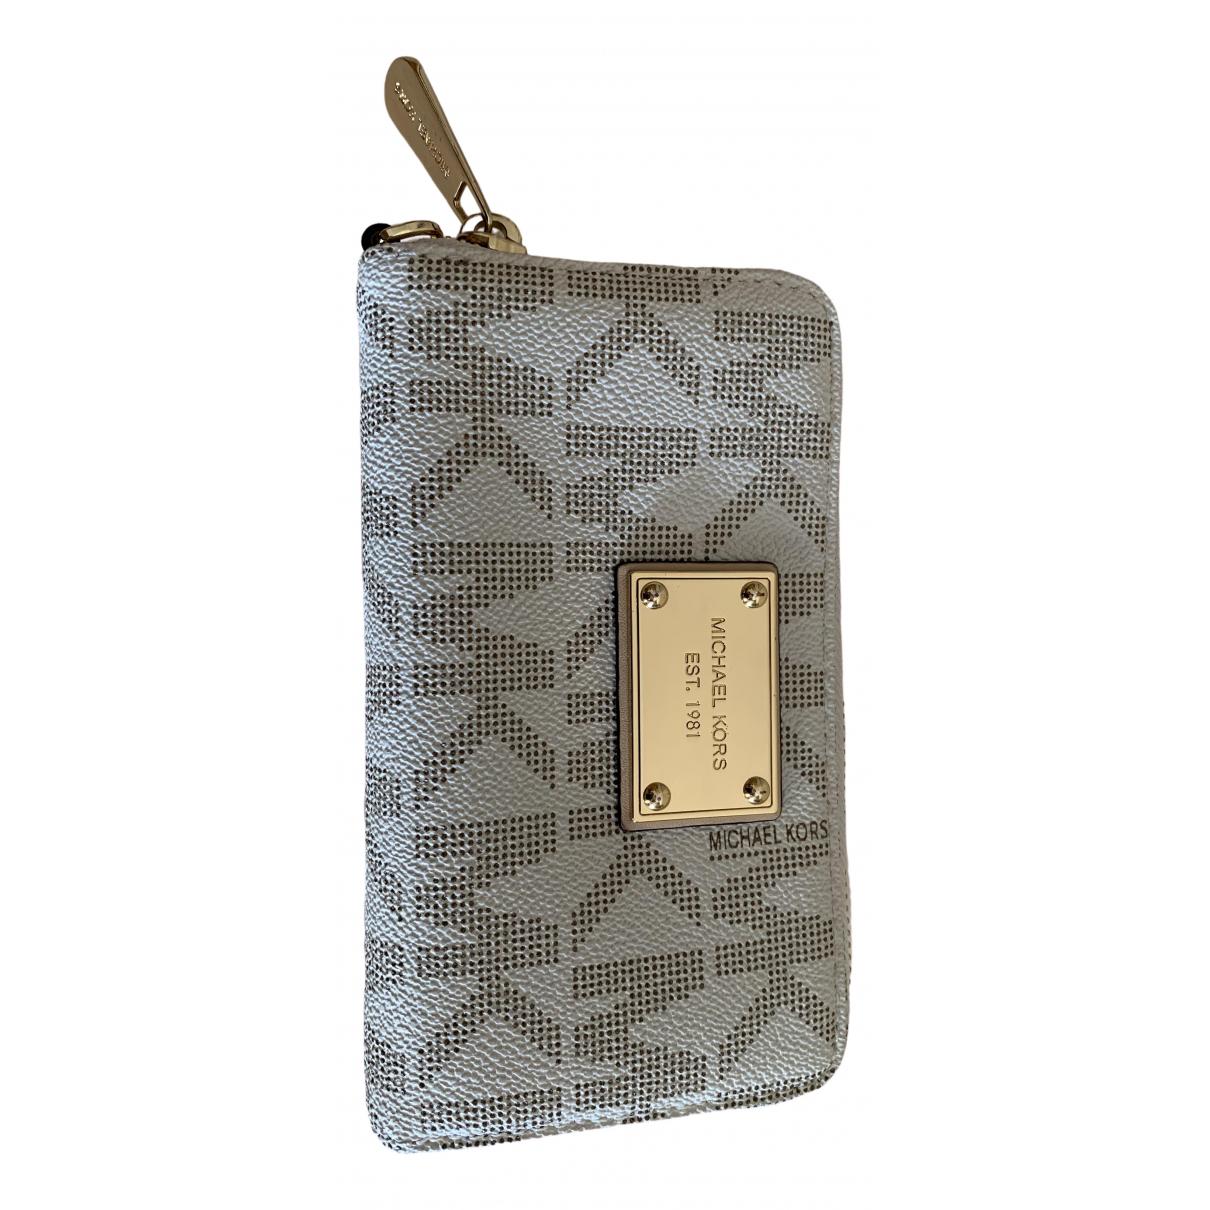 Michael Kors \N White Leather wallet for Women \N